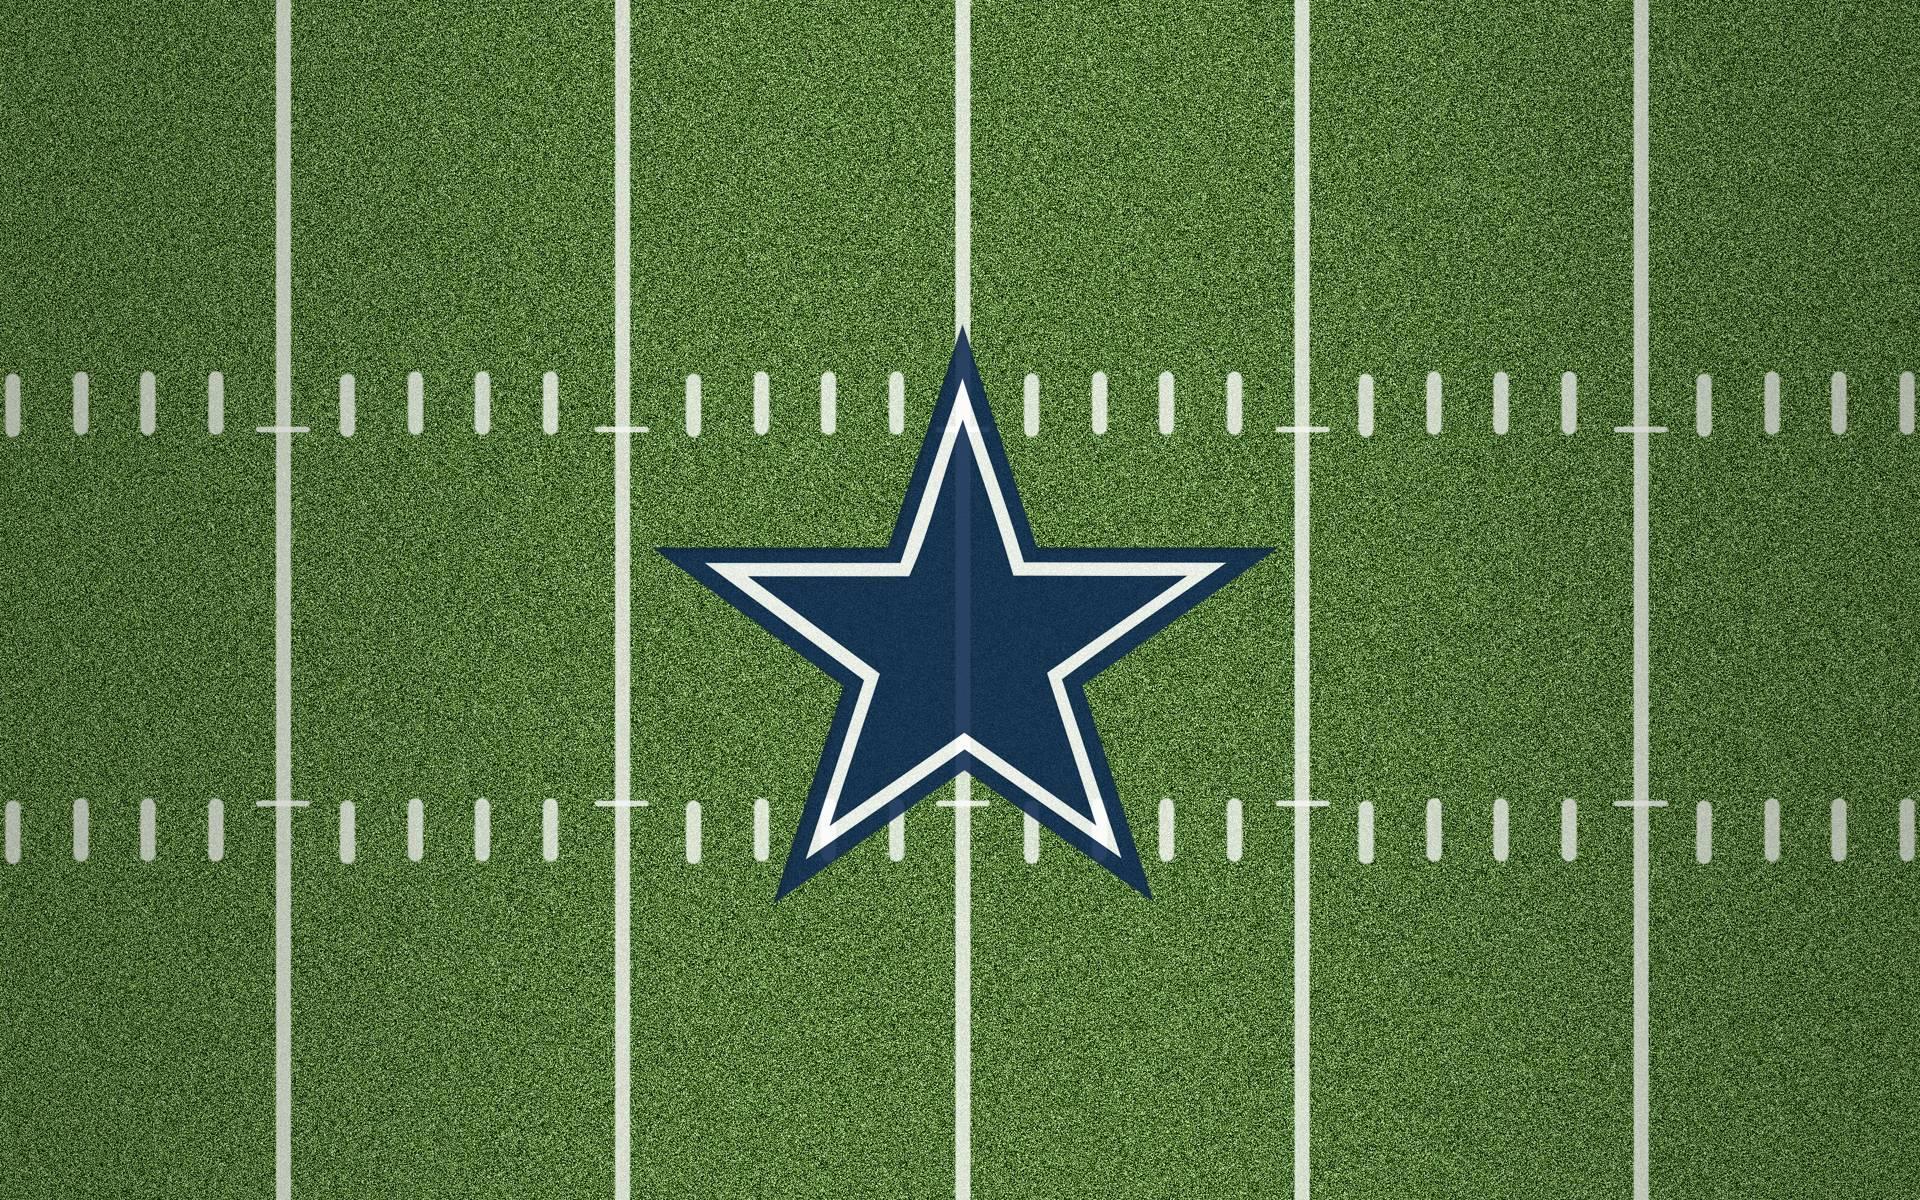 Dallas Cowboys Computer Wallpapers 1920x1200